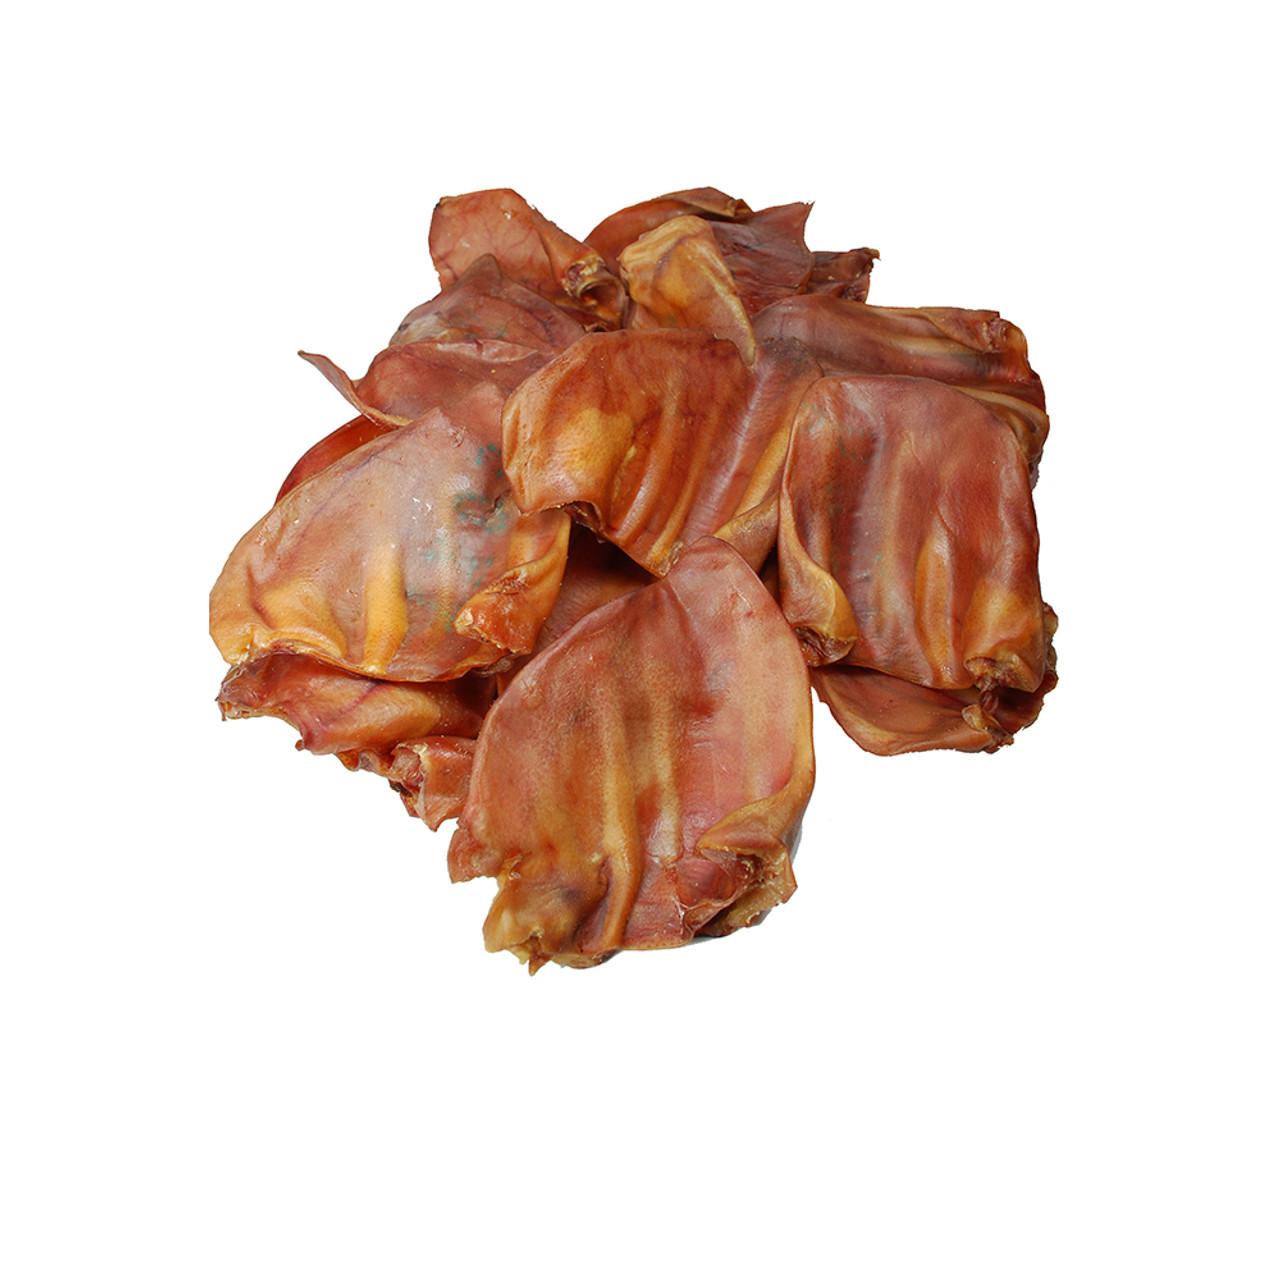 Smokehouse Pig Ear Dog Chew Treat